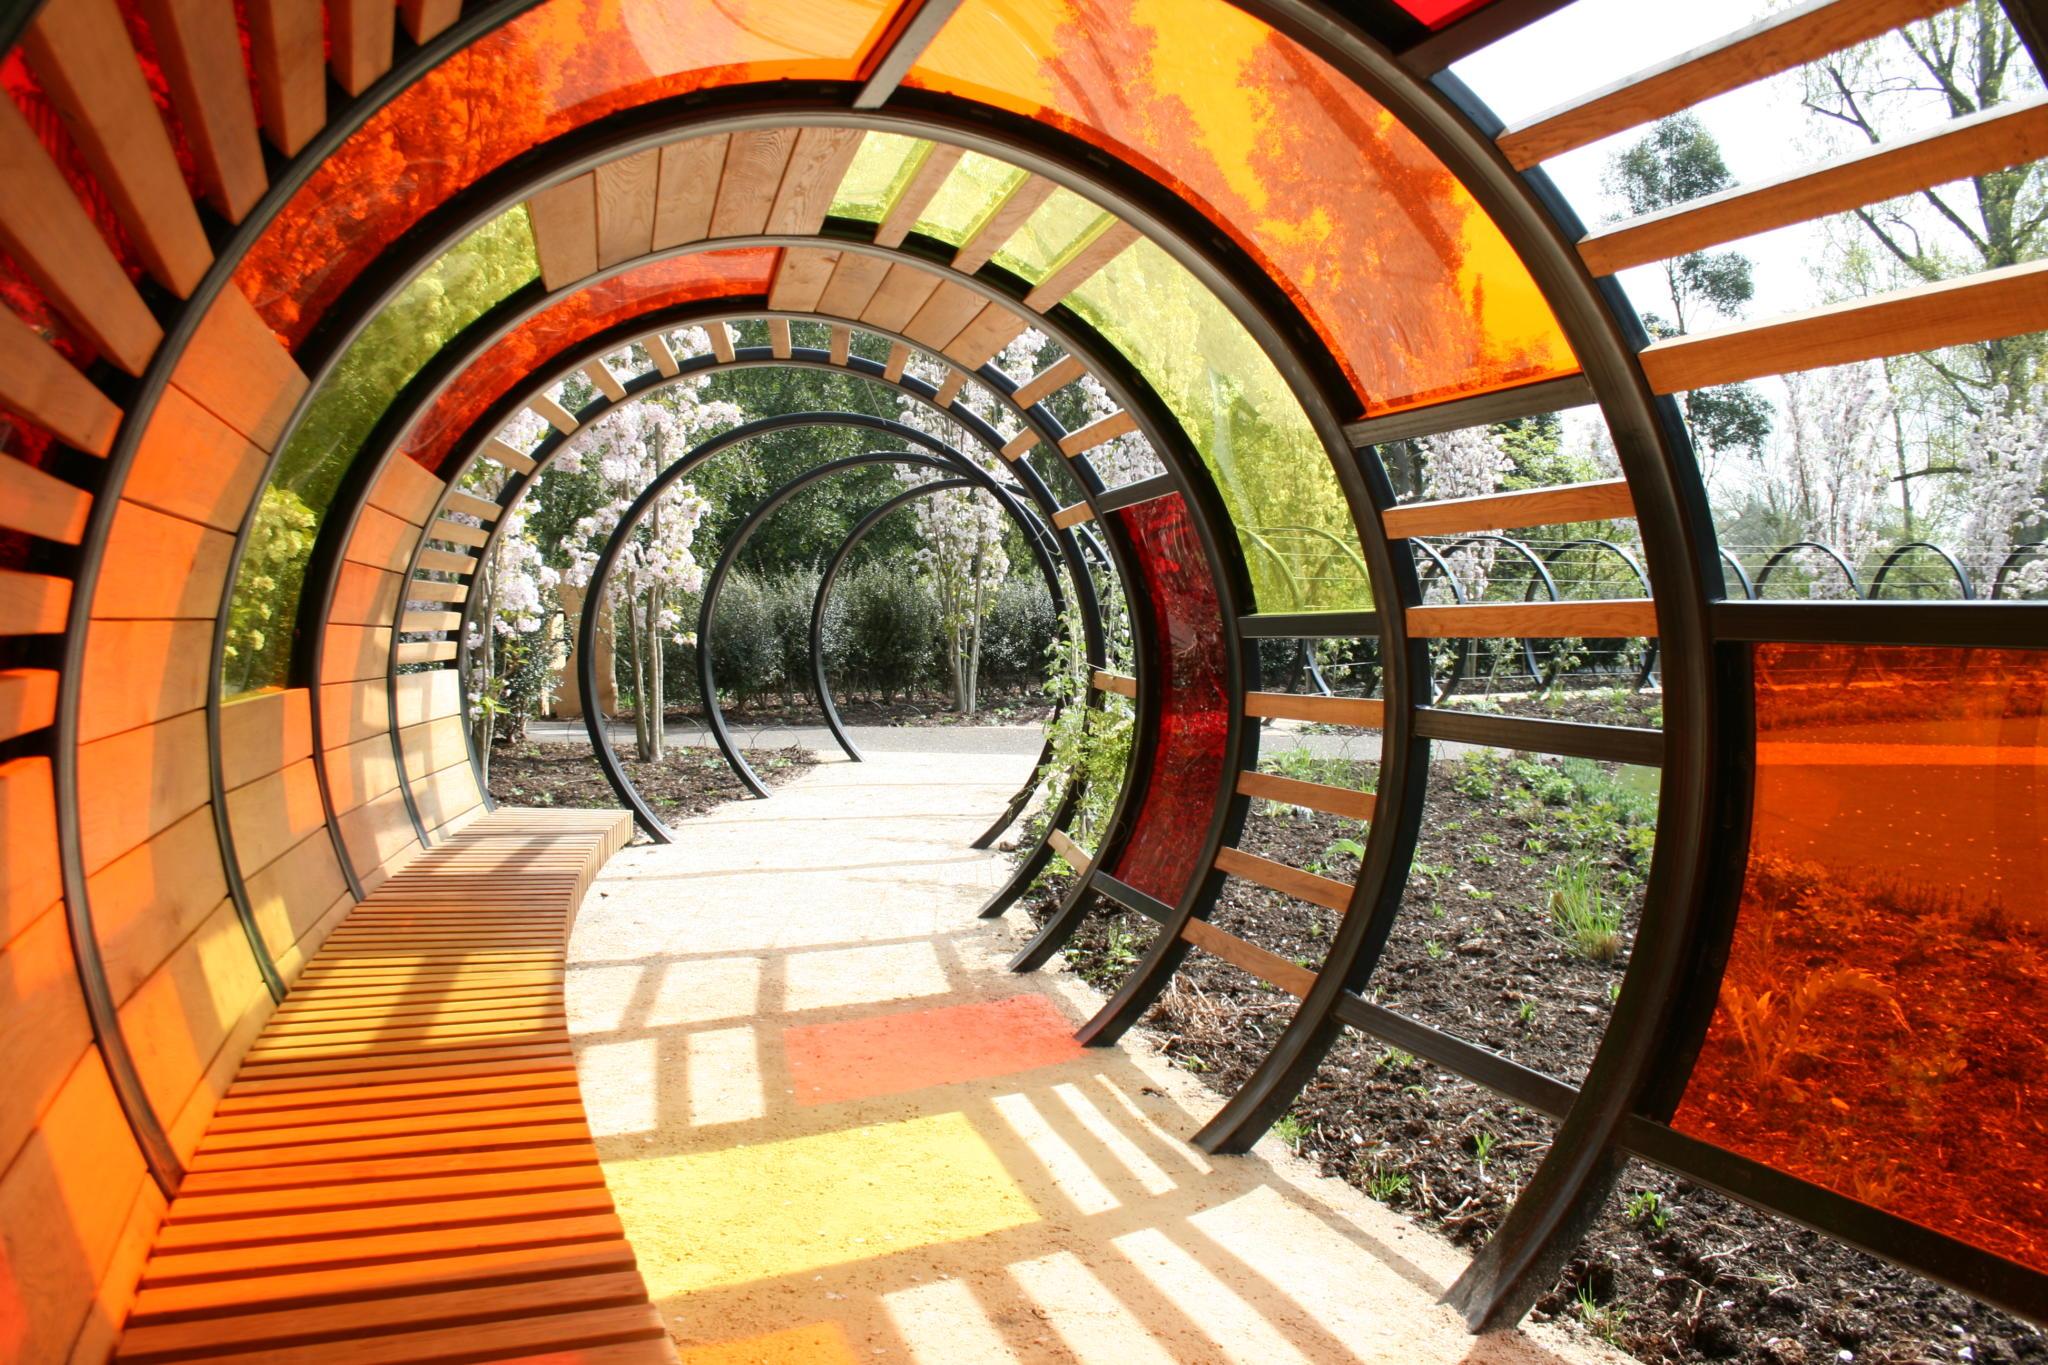 All Urban - Handspring Design - Tunnel Shelter - Royal Botanical Gardens Kew